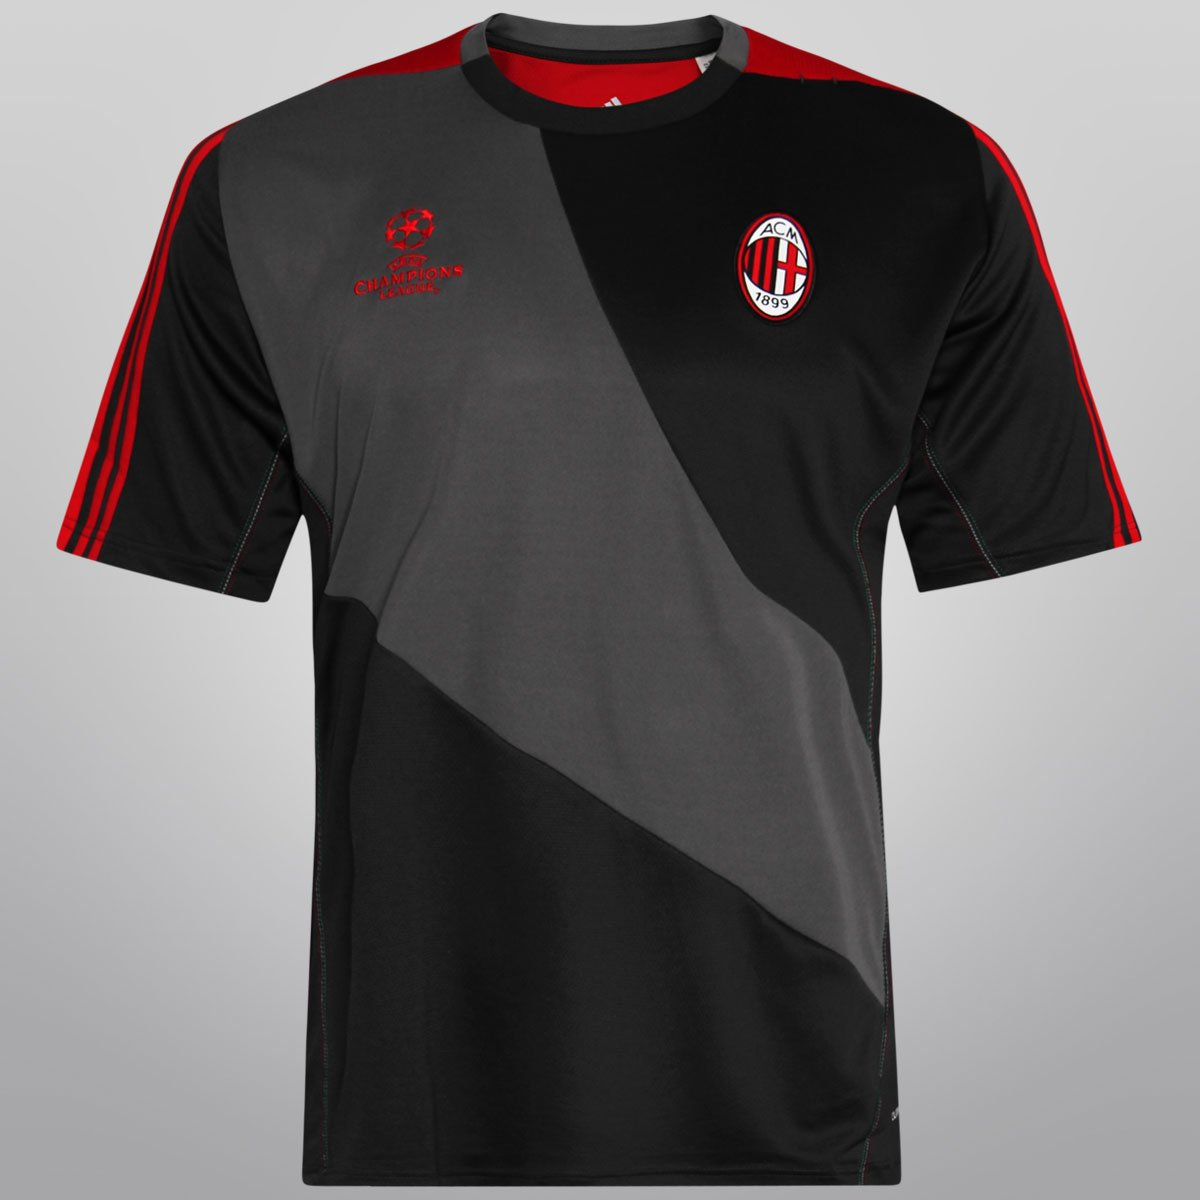 Camisa Adidas Milan UEFA Champions League Treino 12 13 - Compre Agora  ff541ffb9c7f9